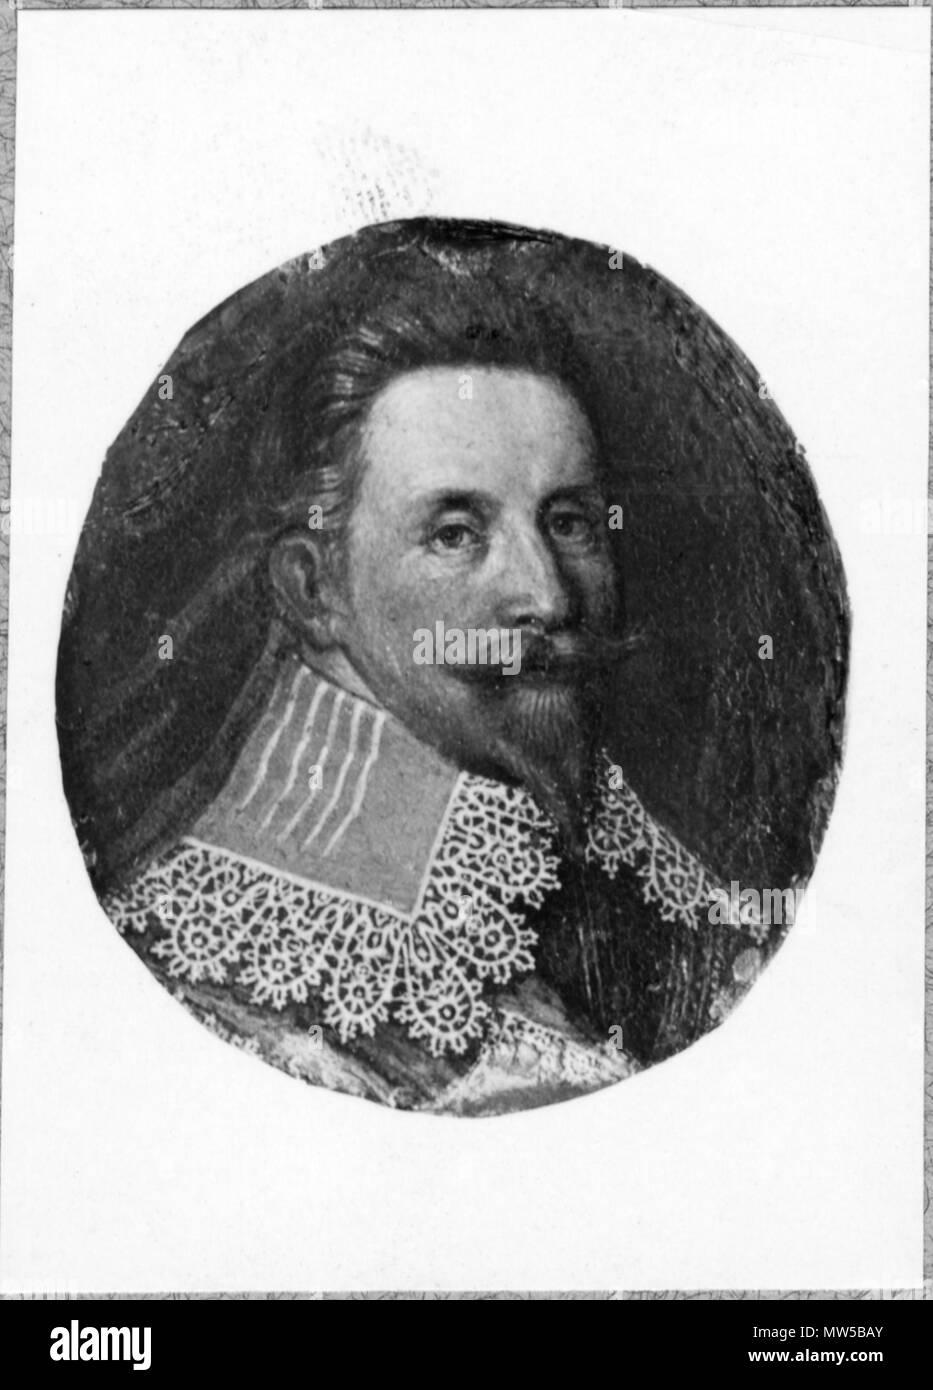 Fil:Bremen Gustav hayeshitzemanfoundation.org Wikipedia